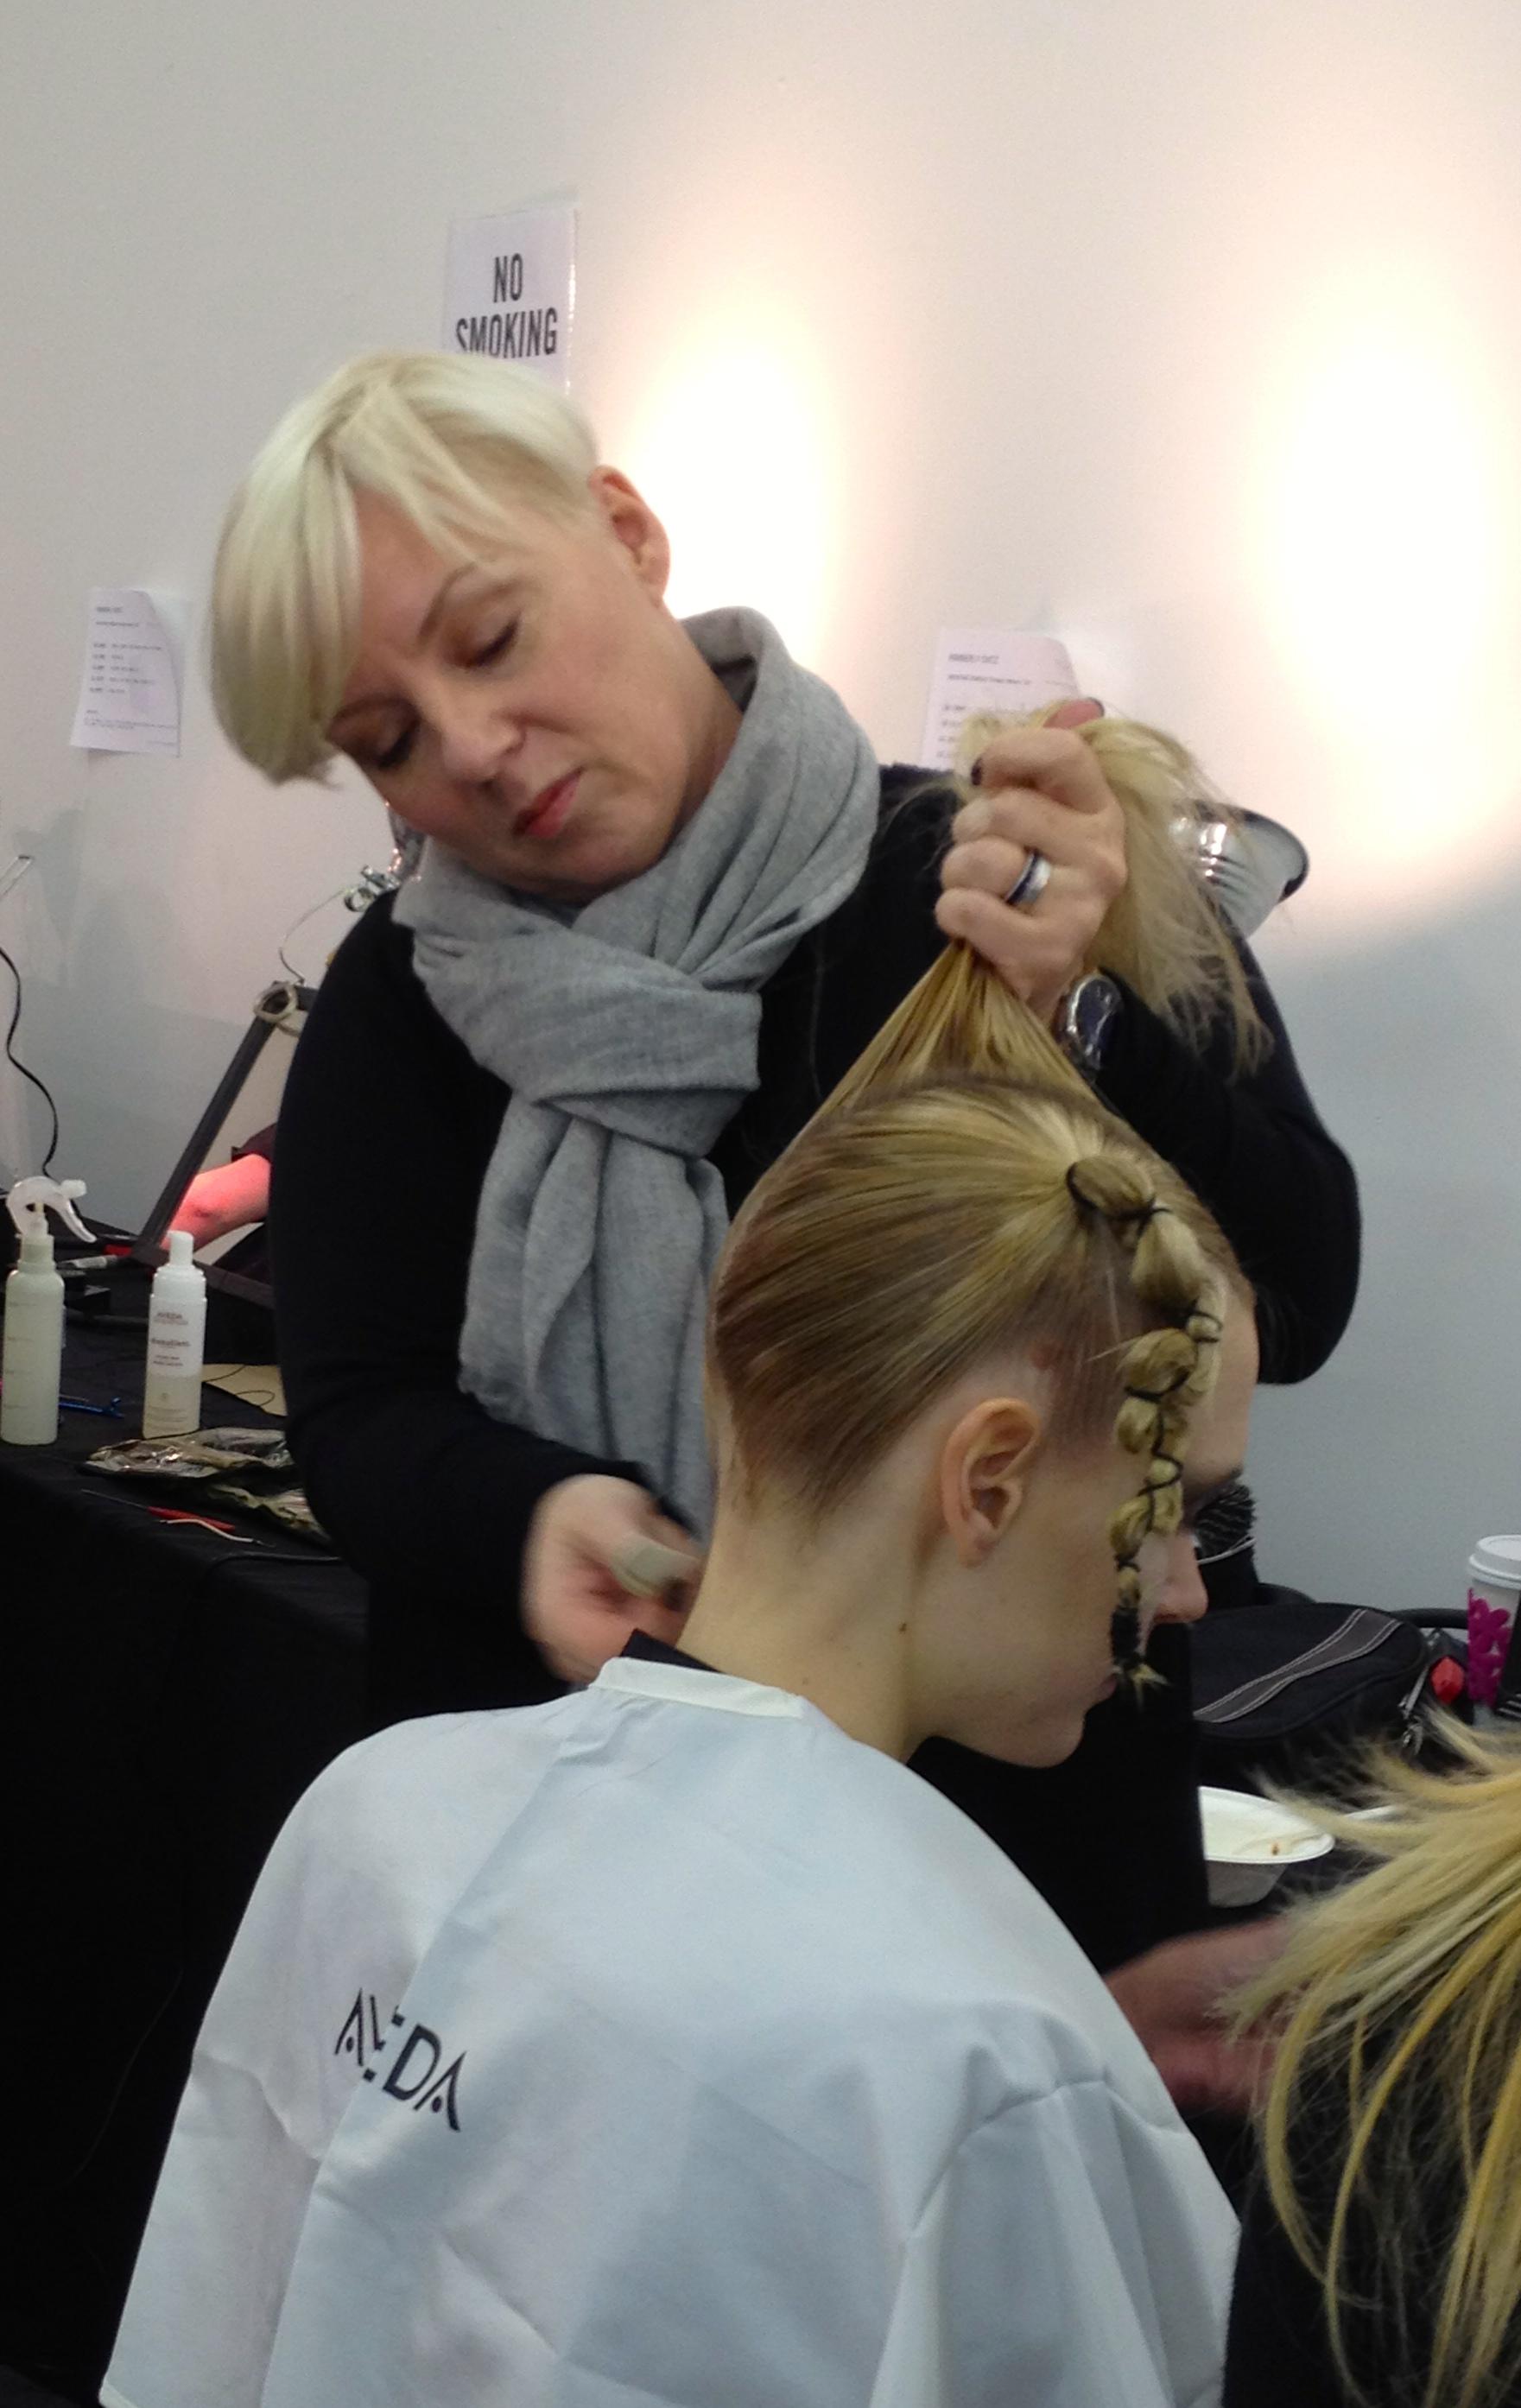 Antoinette Beenders creating shield of hair for Kimberly Ovitz show.